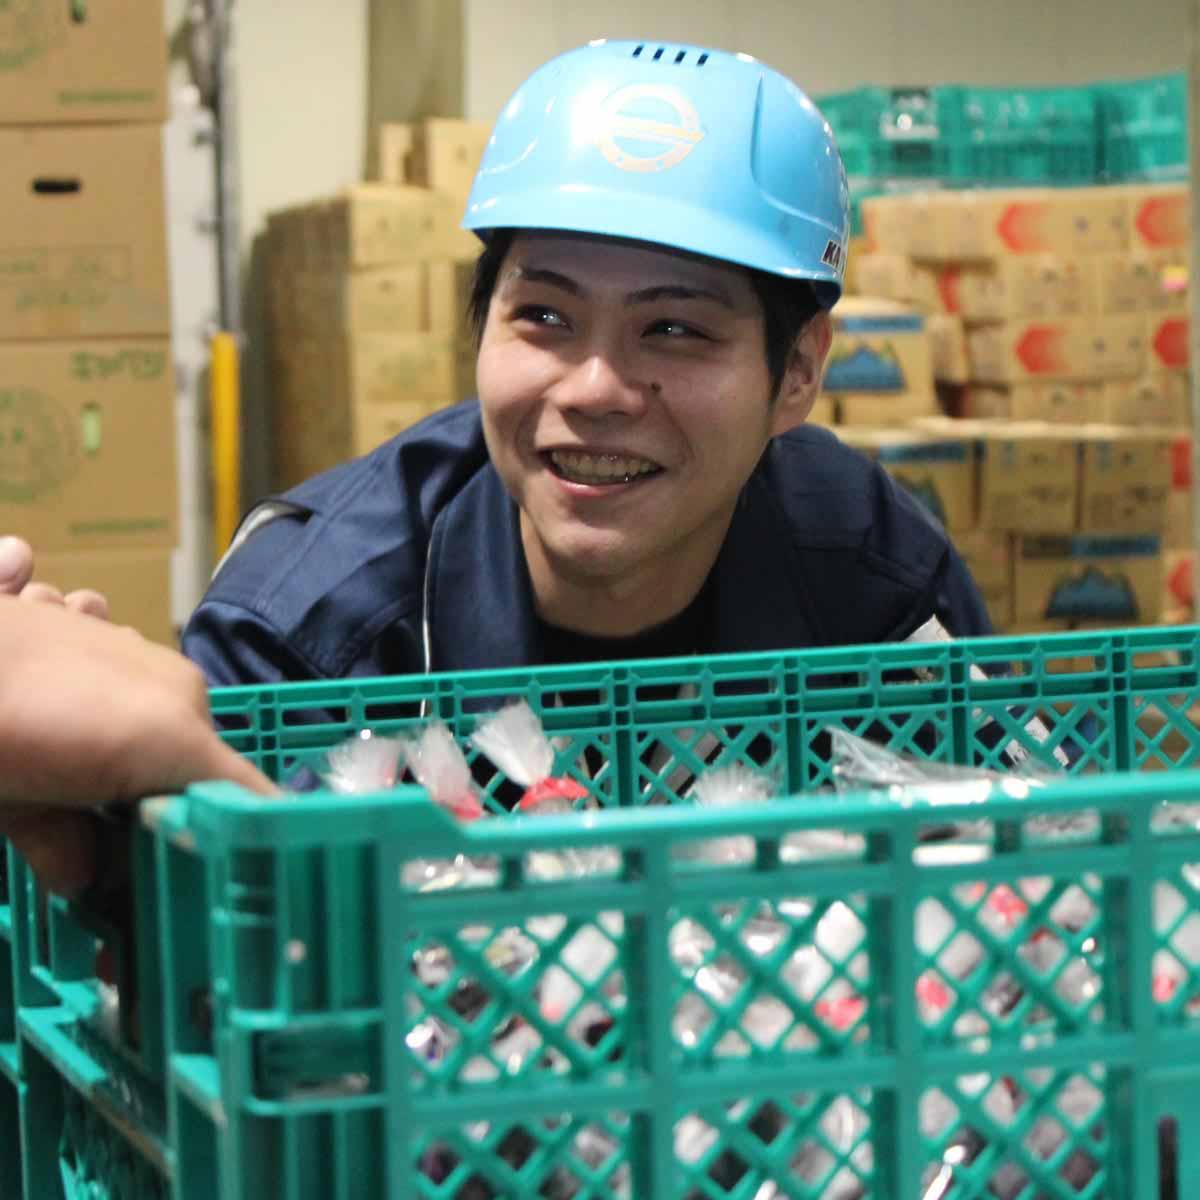 KDC(京都物流センター) 主任 倉庫業務